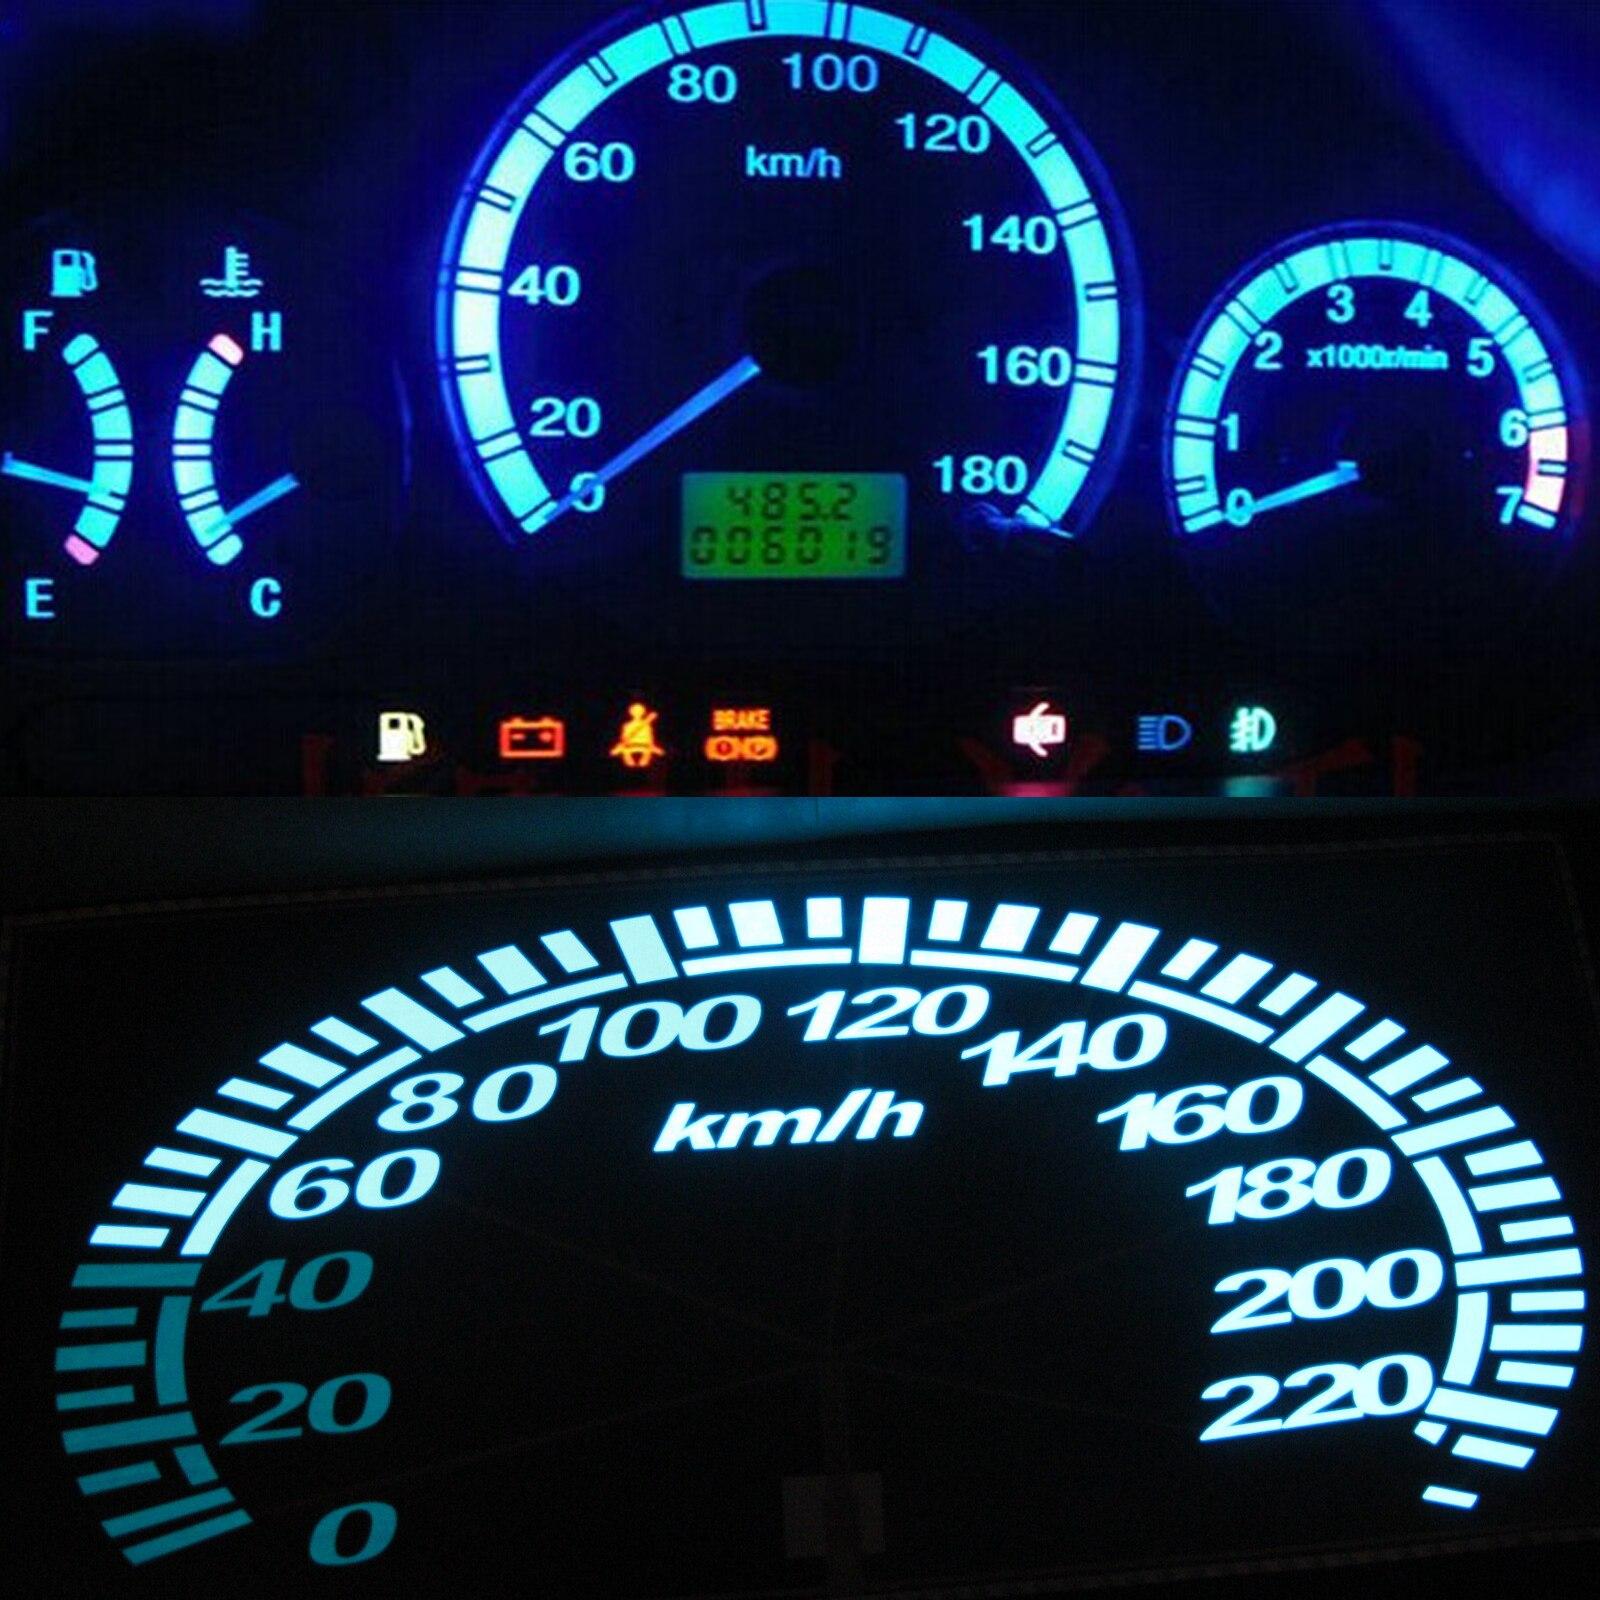 T5-5050-SMD-T10-Auto-Gauge-Led-lampen-Lampen-2721-73-70-W5W-124-147-DXY88 Wunderbar Led Lampen Auto Innenraum Dekorationen